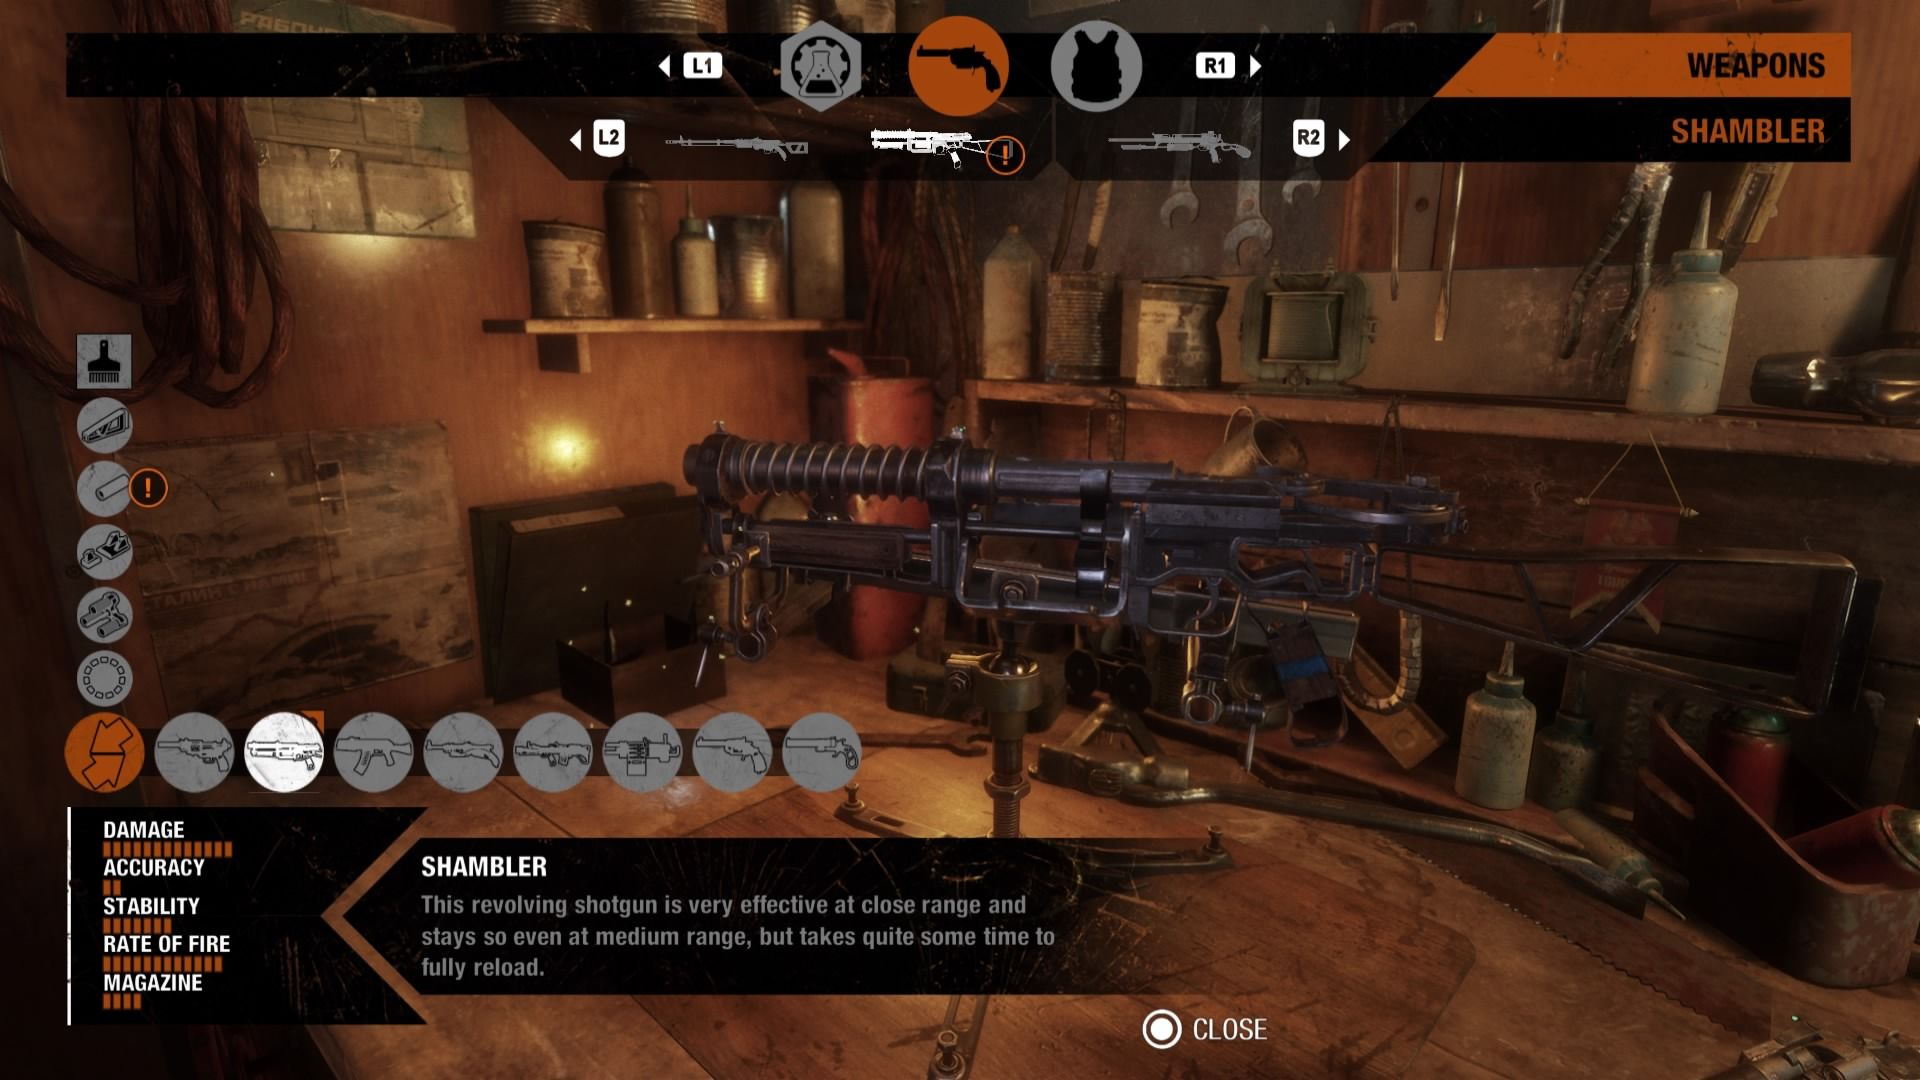 metro-exodus-weapons-list-shambler-customization-guide